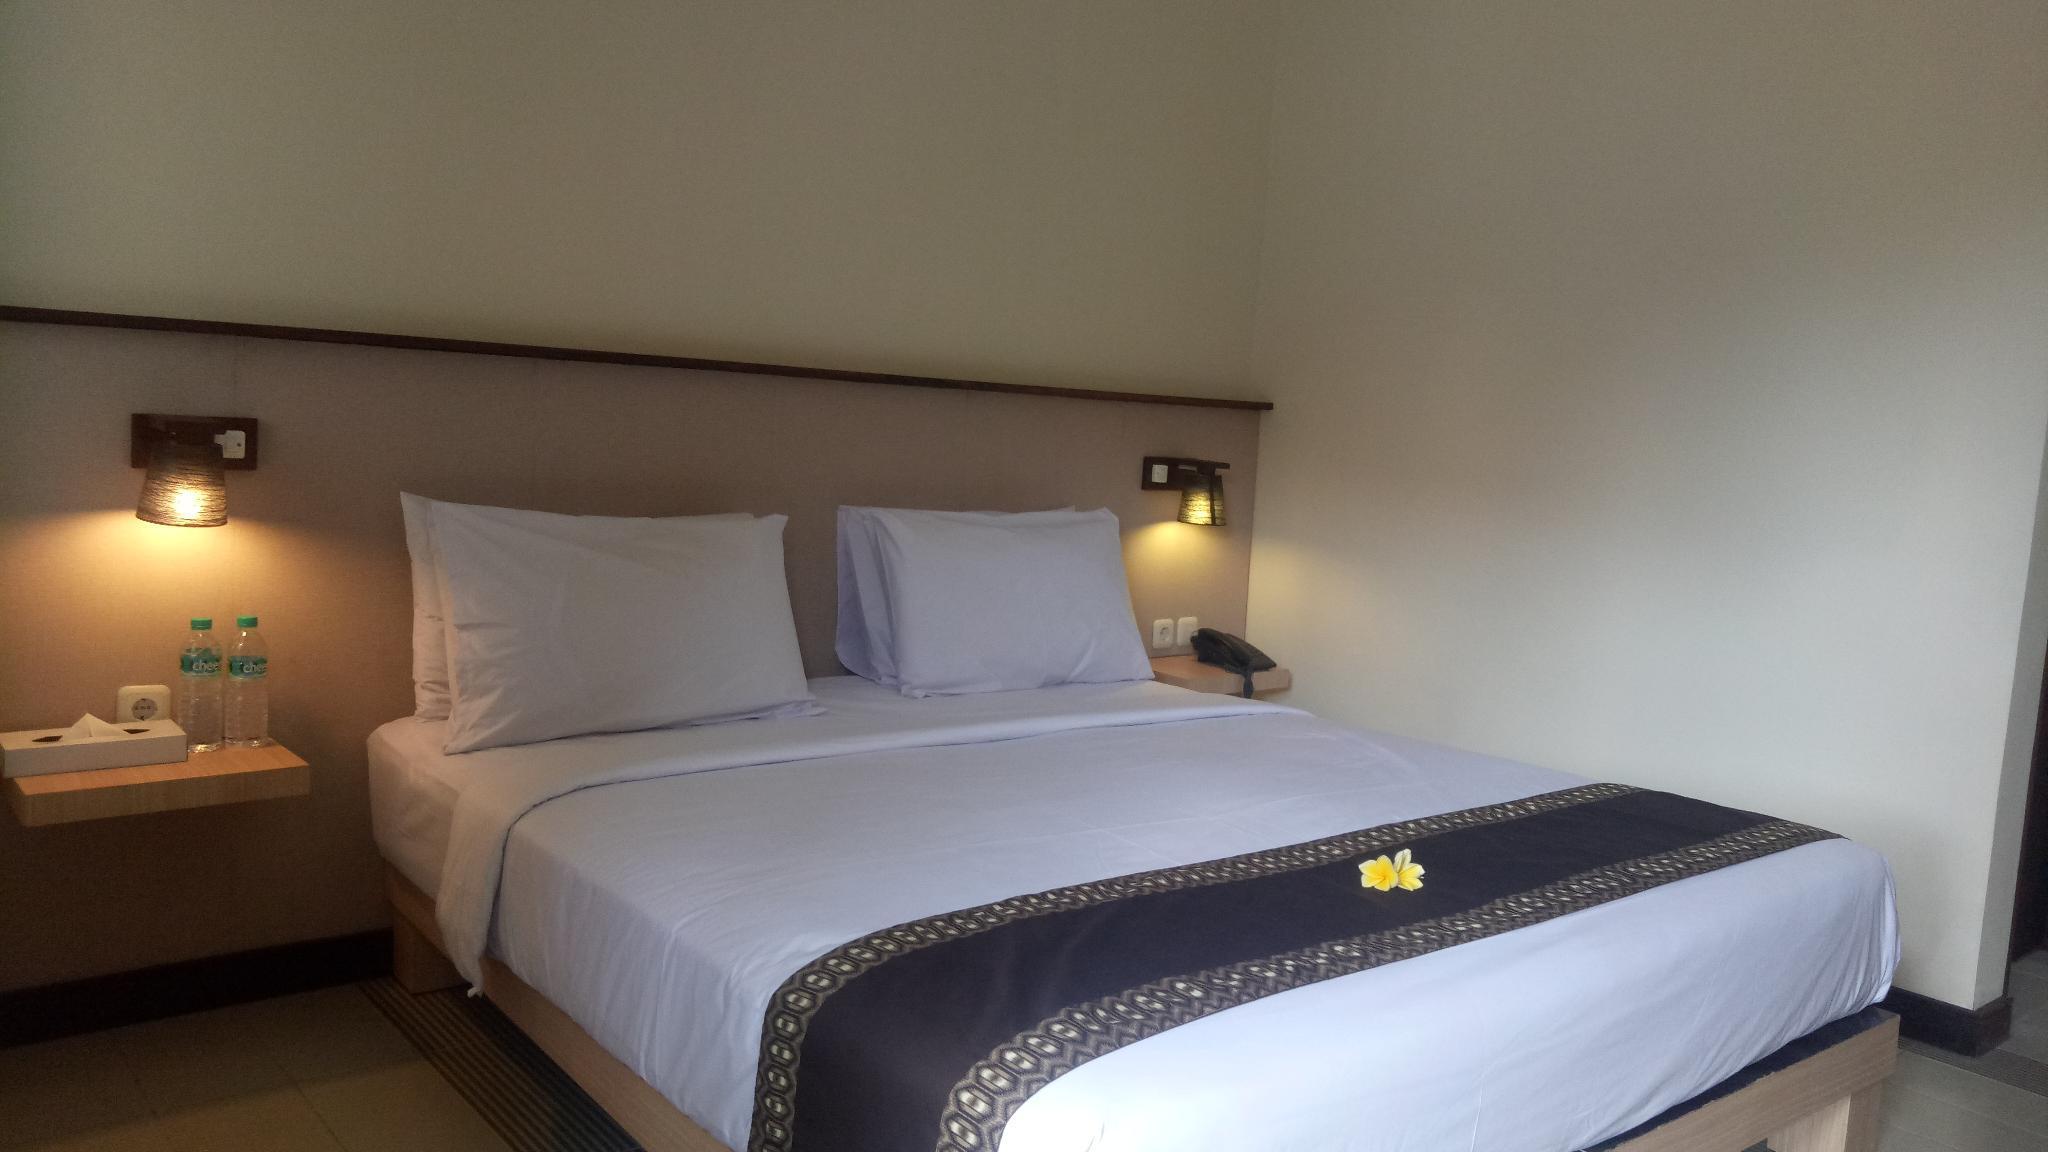 Keola Hotel